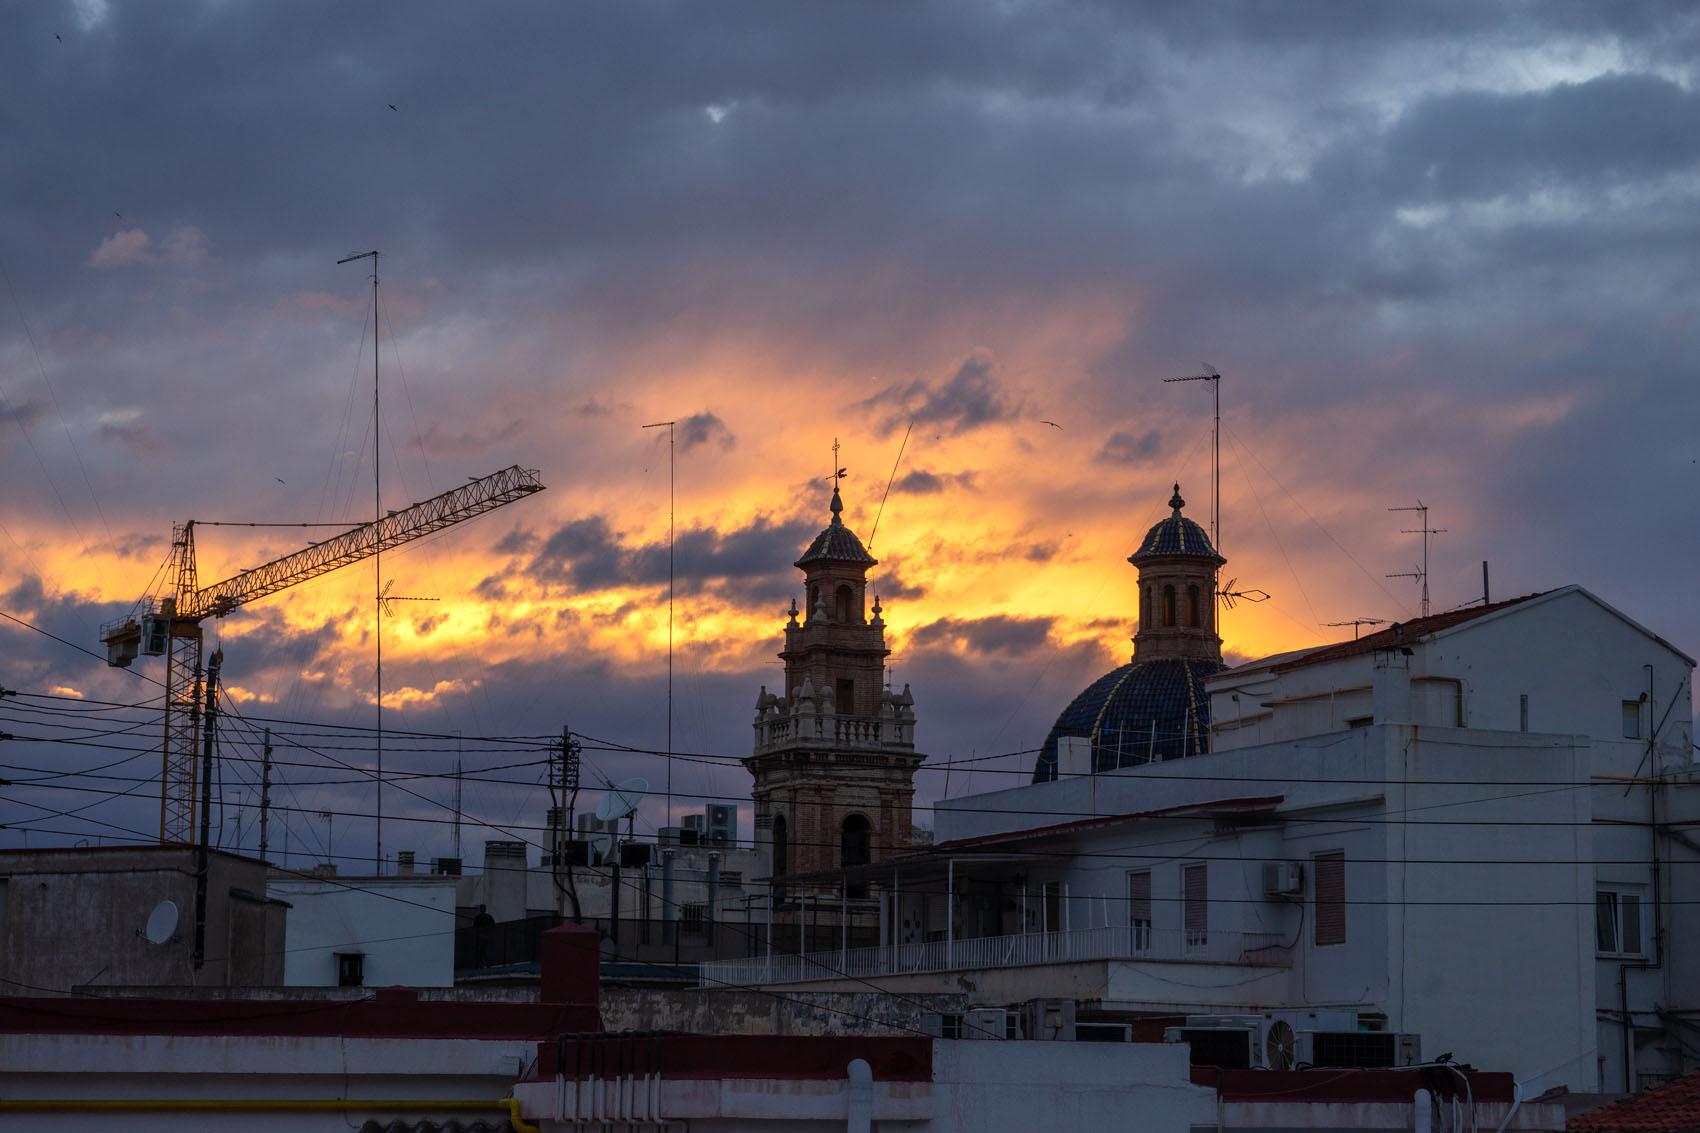 quarantine sunset Valencia